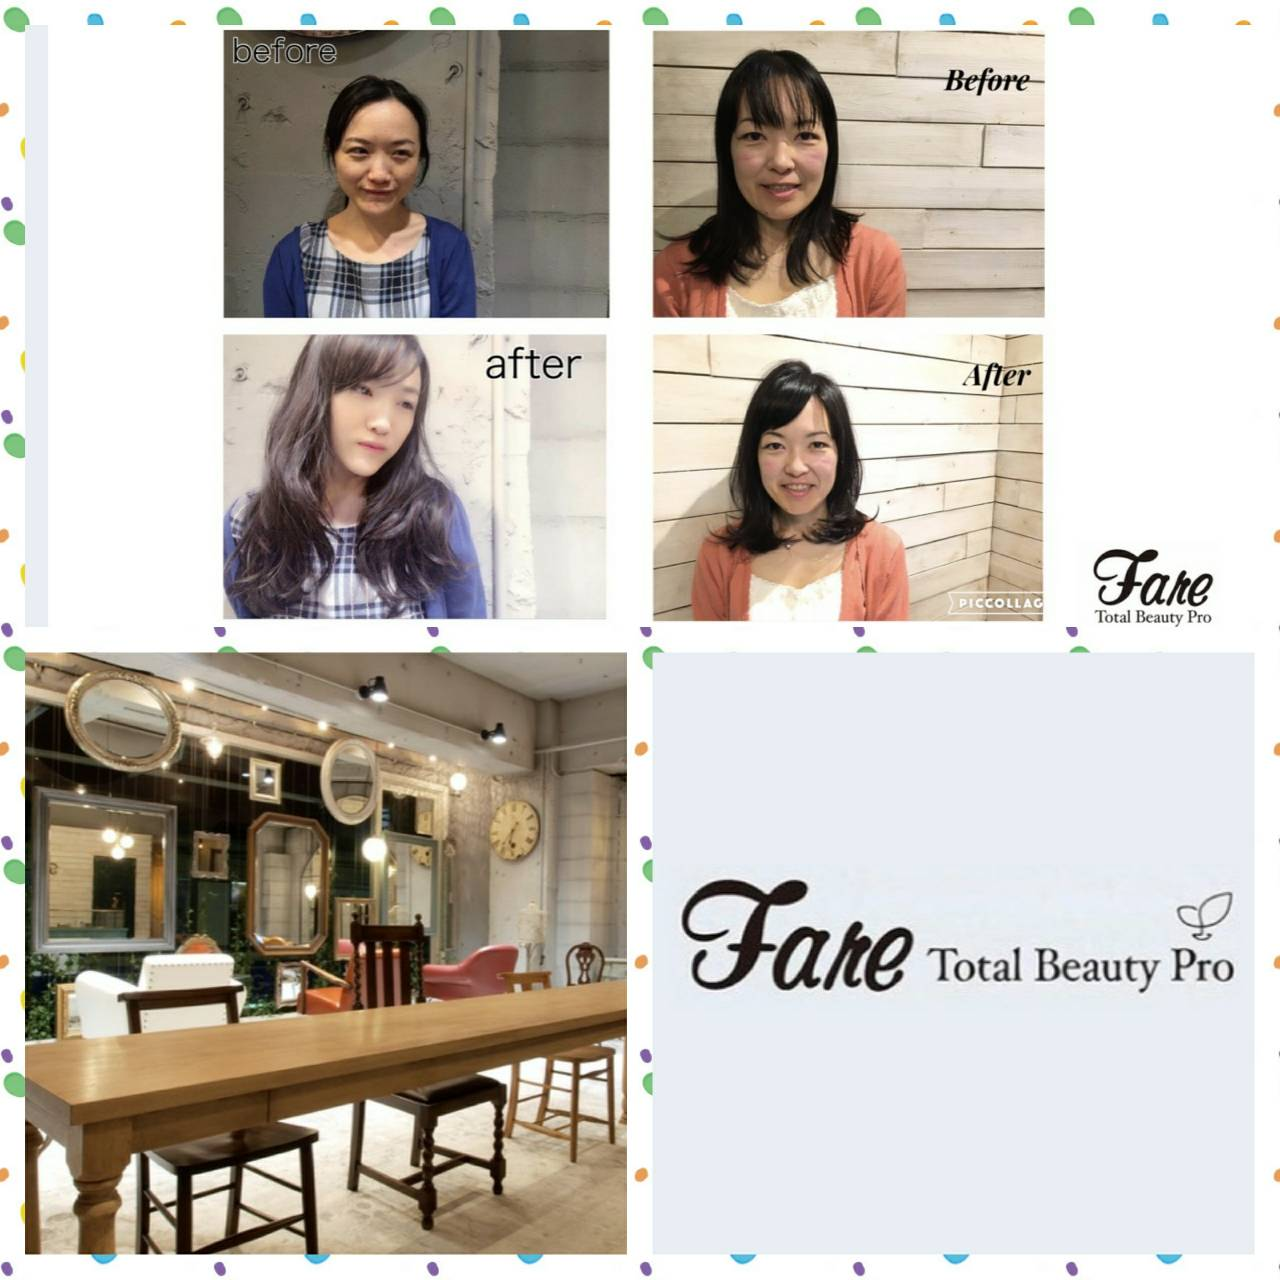 Fare Total Beauty Pro